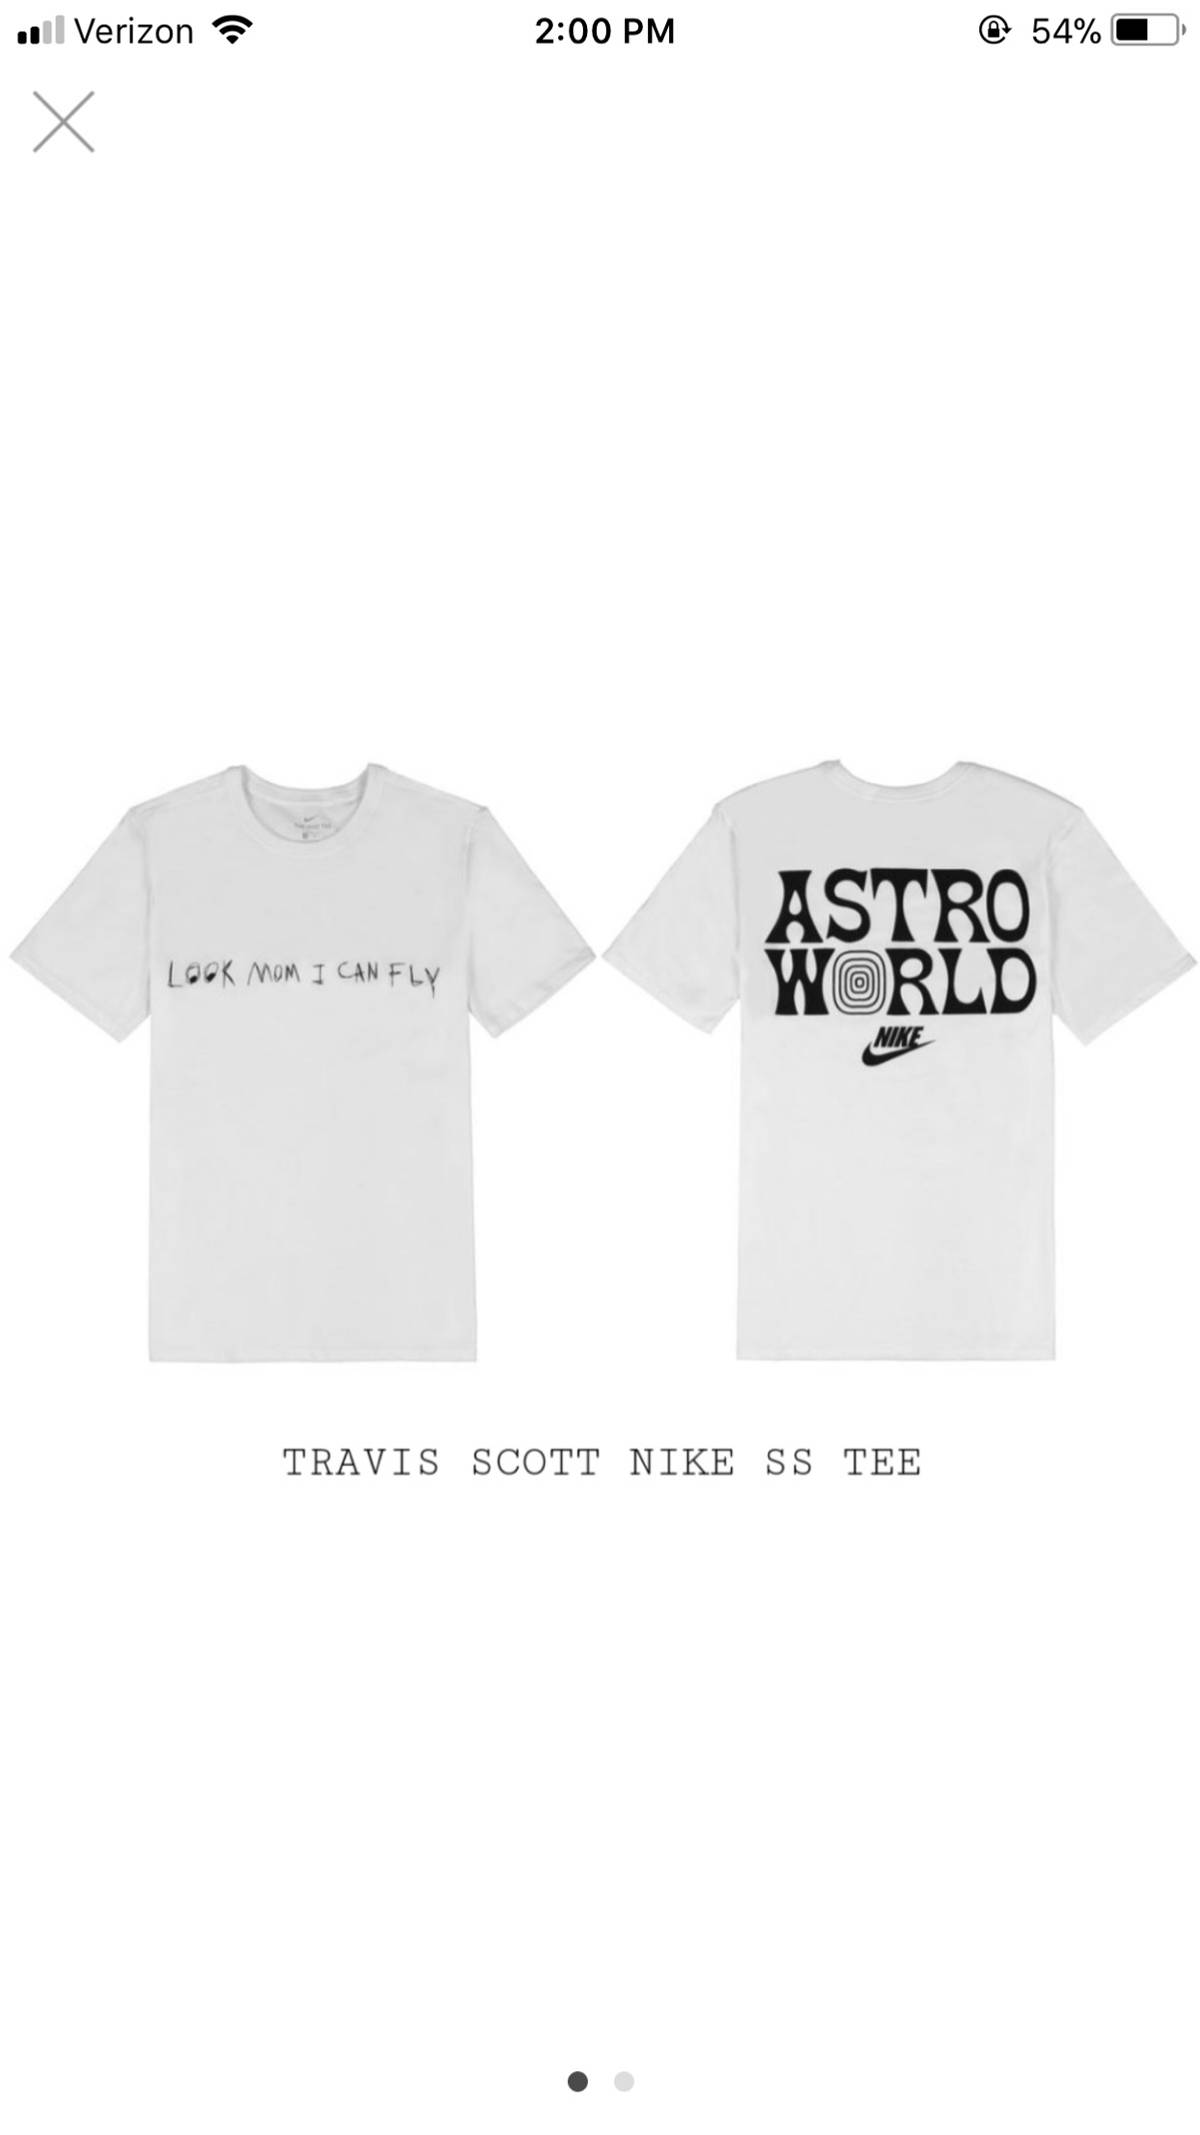 0c9ad163 Nike Travis Scott Nike SS Tee 4 Astroworld Large Size l - Short ...